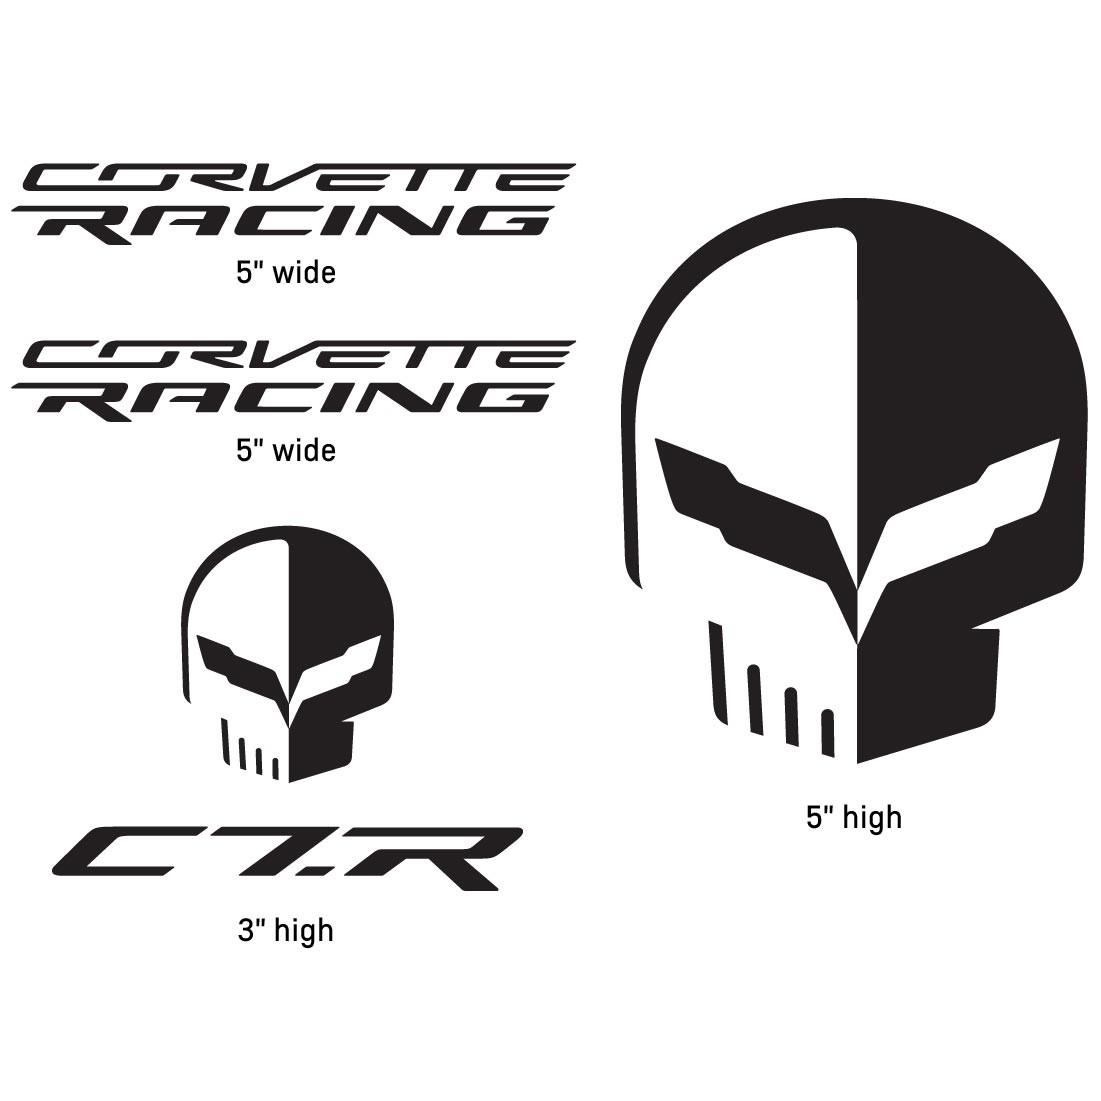 C7 Corvette Logo Wallpaper additionally Corvette Parts furthermore Toyota Axle Diagram furthermore 2014 C7 Corvette Stingray Nose Cap 2pc also 185436 Chevy Lt1 Crate Engine Video 500 Rebate Tempt Buyers. on 2016 chevrolet corvette stingray